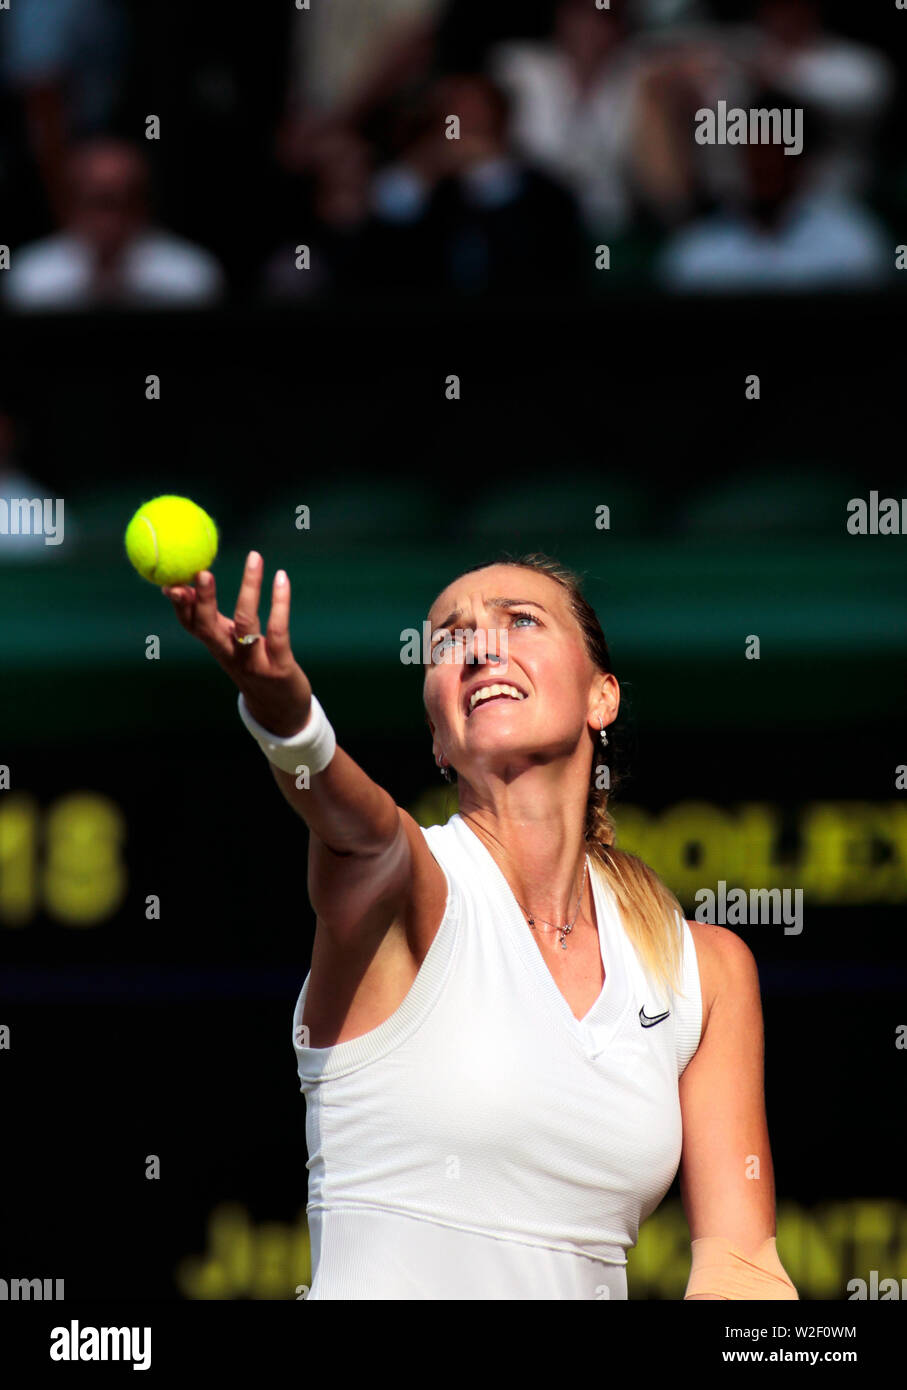 Wimbledon, 8 July 2019 - Petra Kvitova serving during her fourth round match against Johanna Konta on Center Court at Wimbledon today.  Kota won the match in three sets. Credit: Adam Stoltman/Alamy Live News - Stock Image